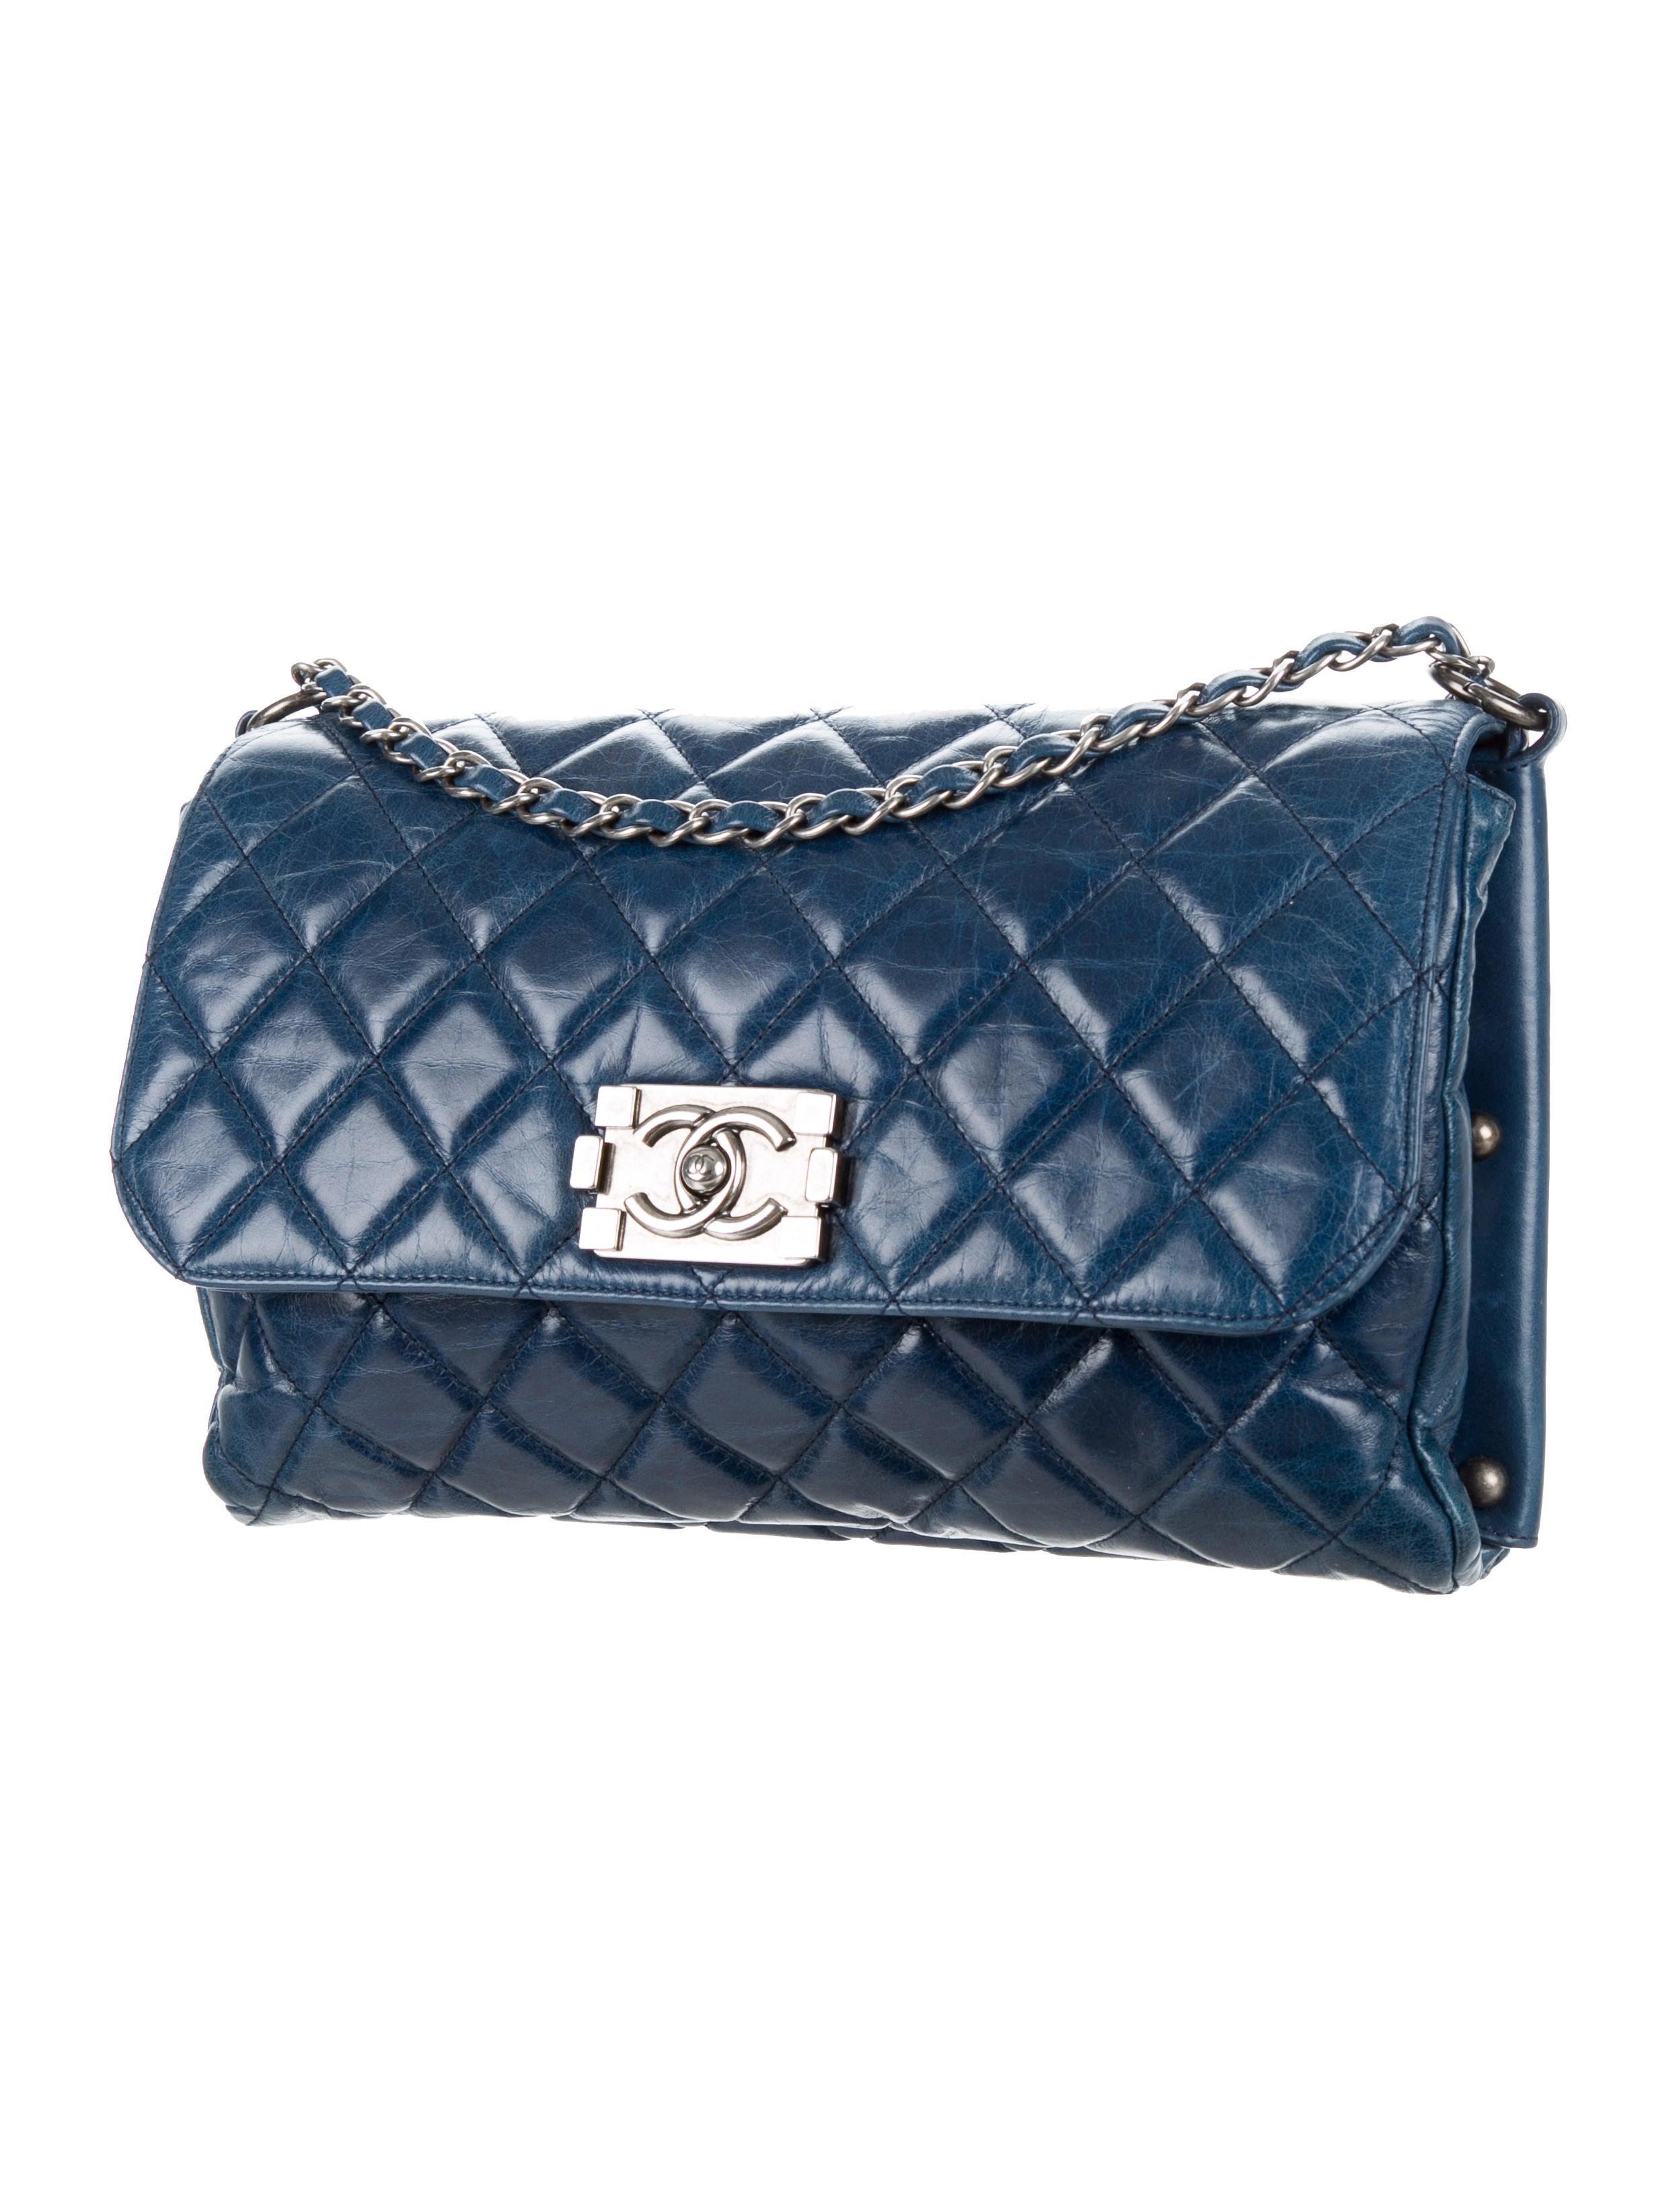 Chanel Quilted Boy Flap Bag - Handbags - CHA150052